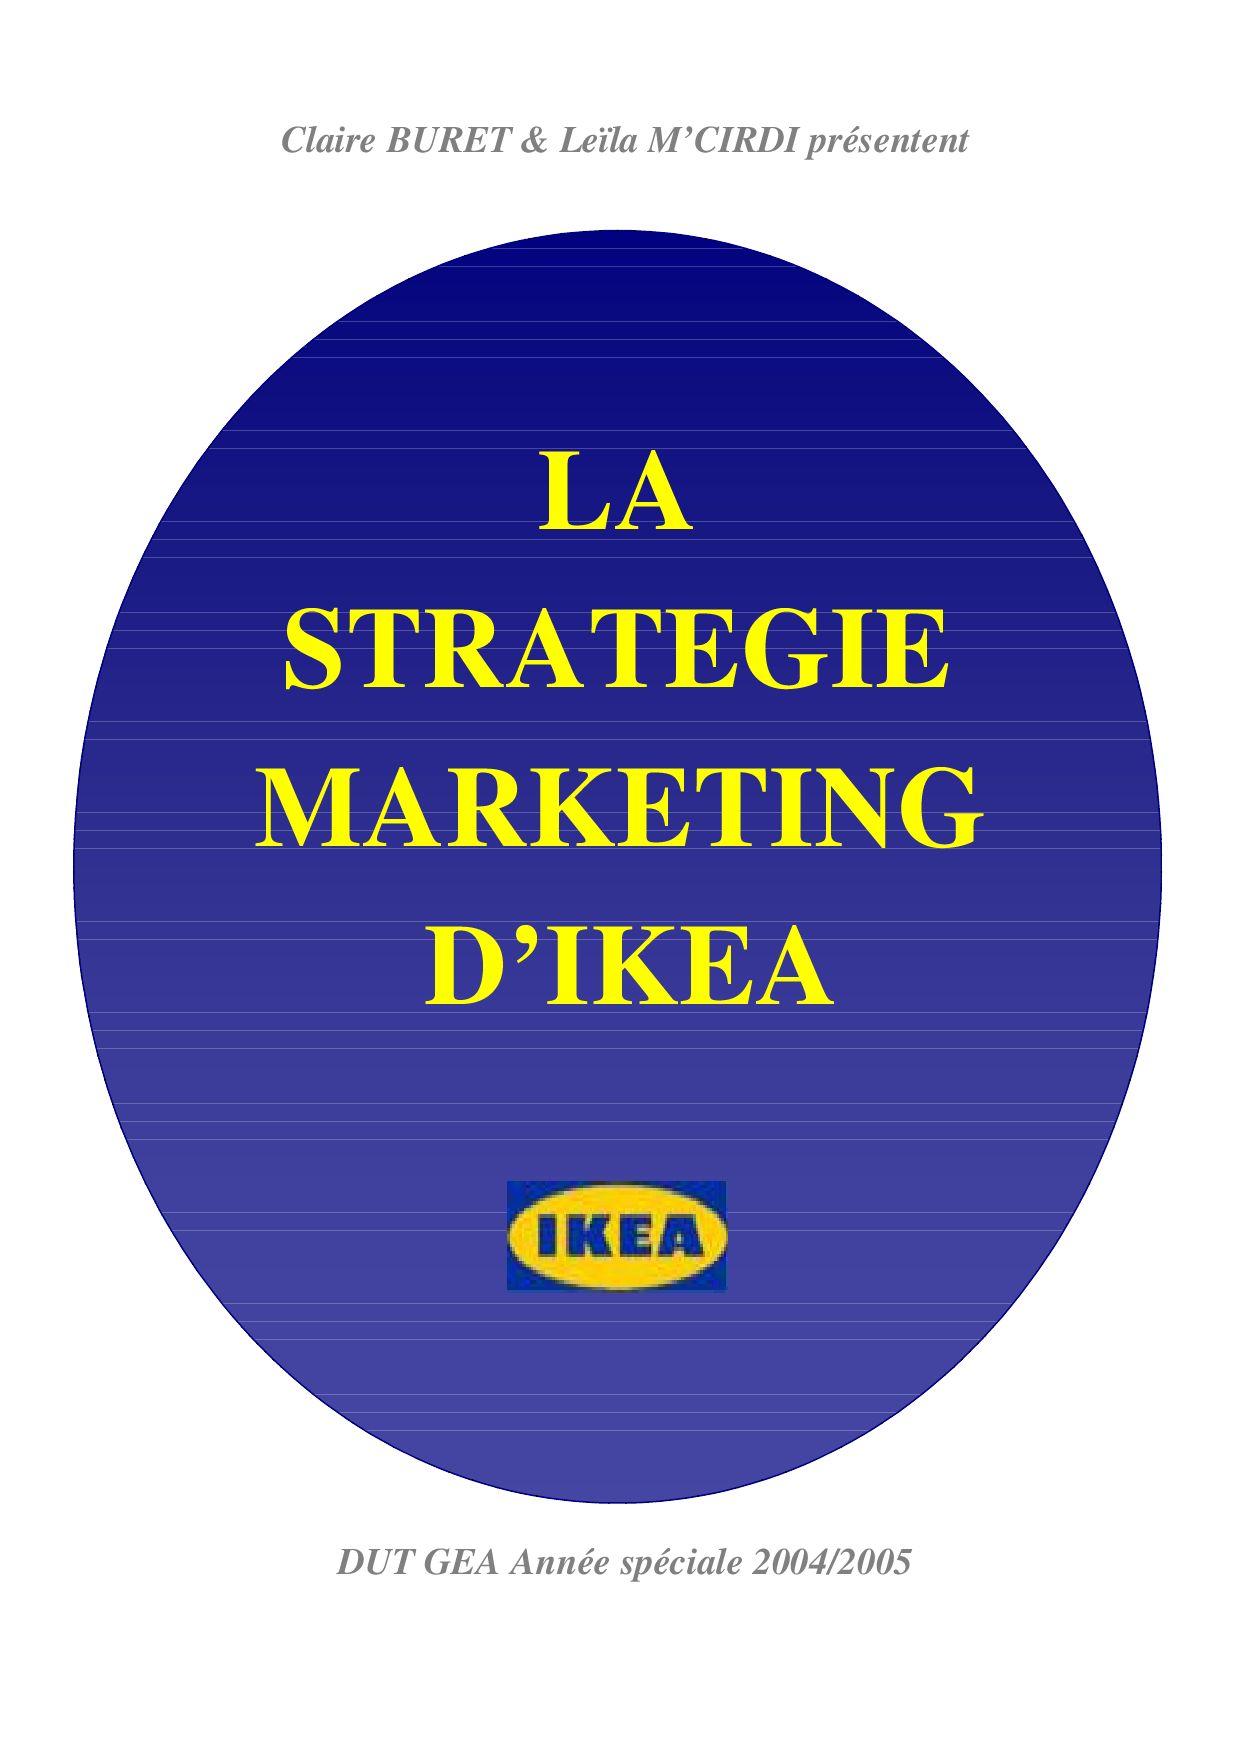 La Strategie Marketing Dikea By Regis Vansnick Issuu